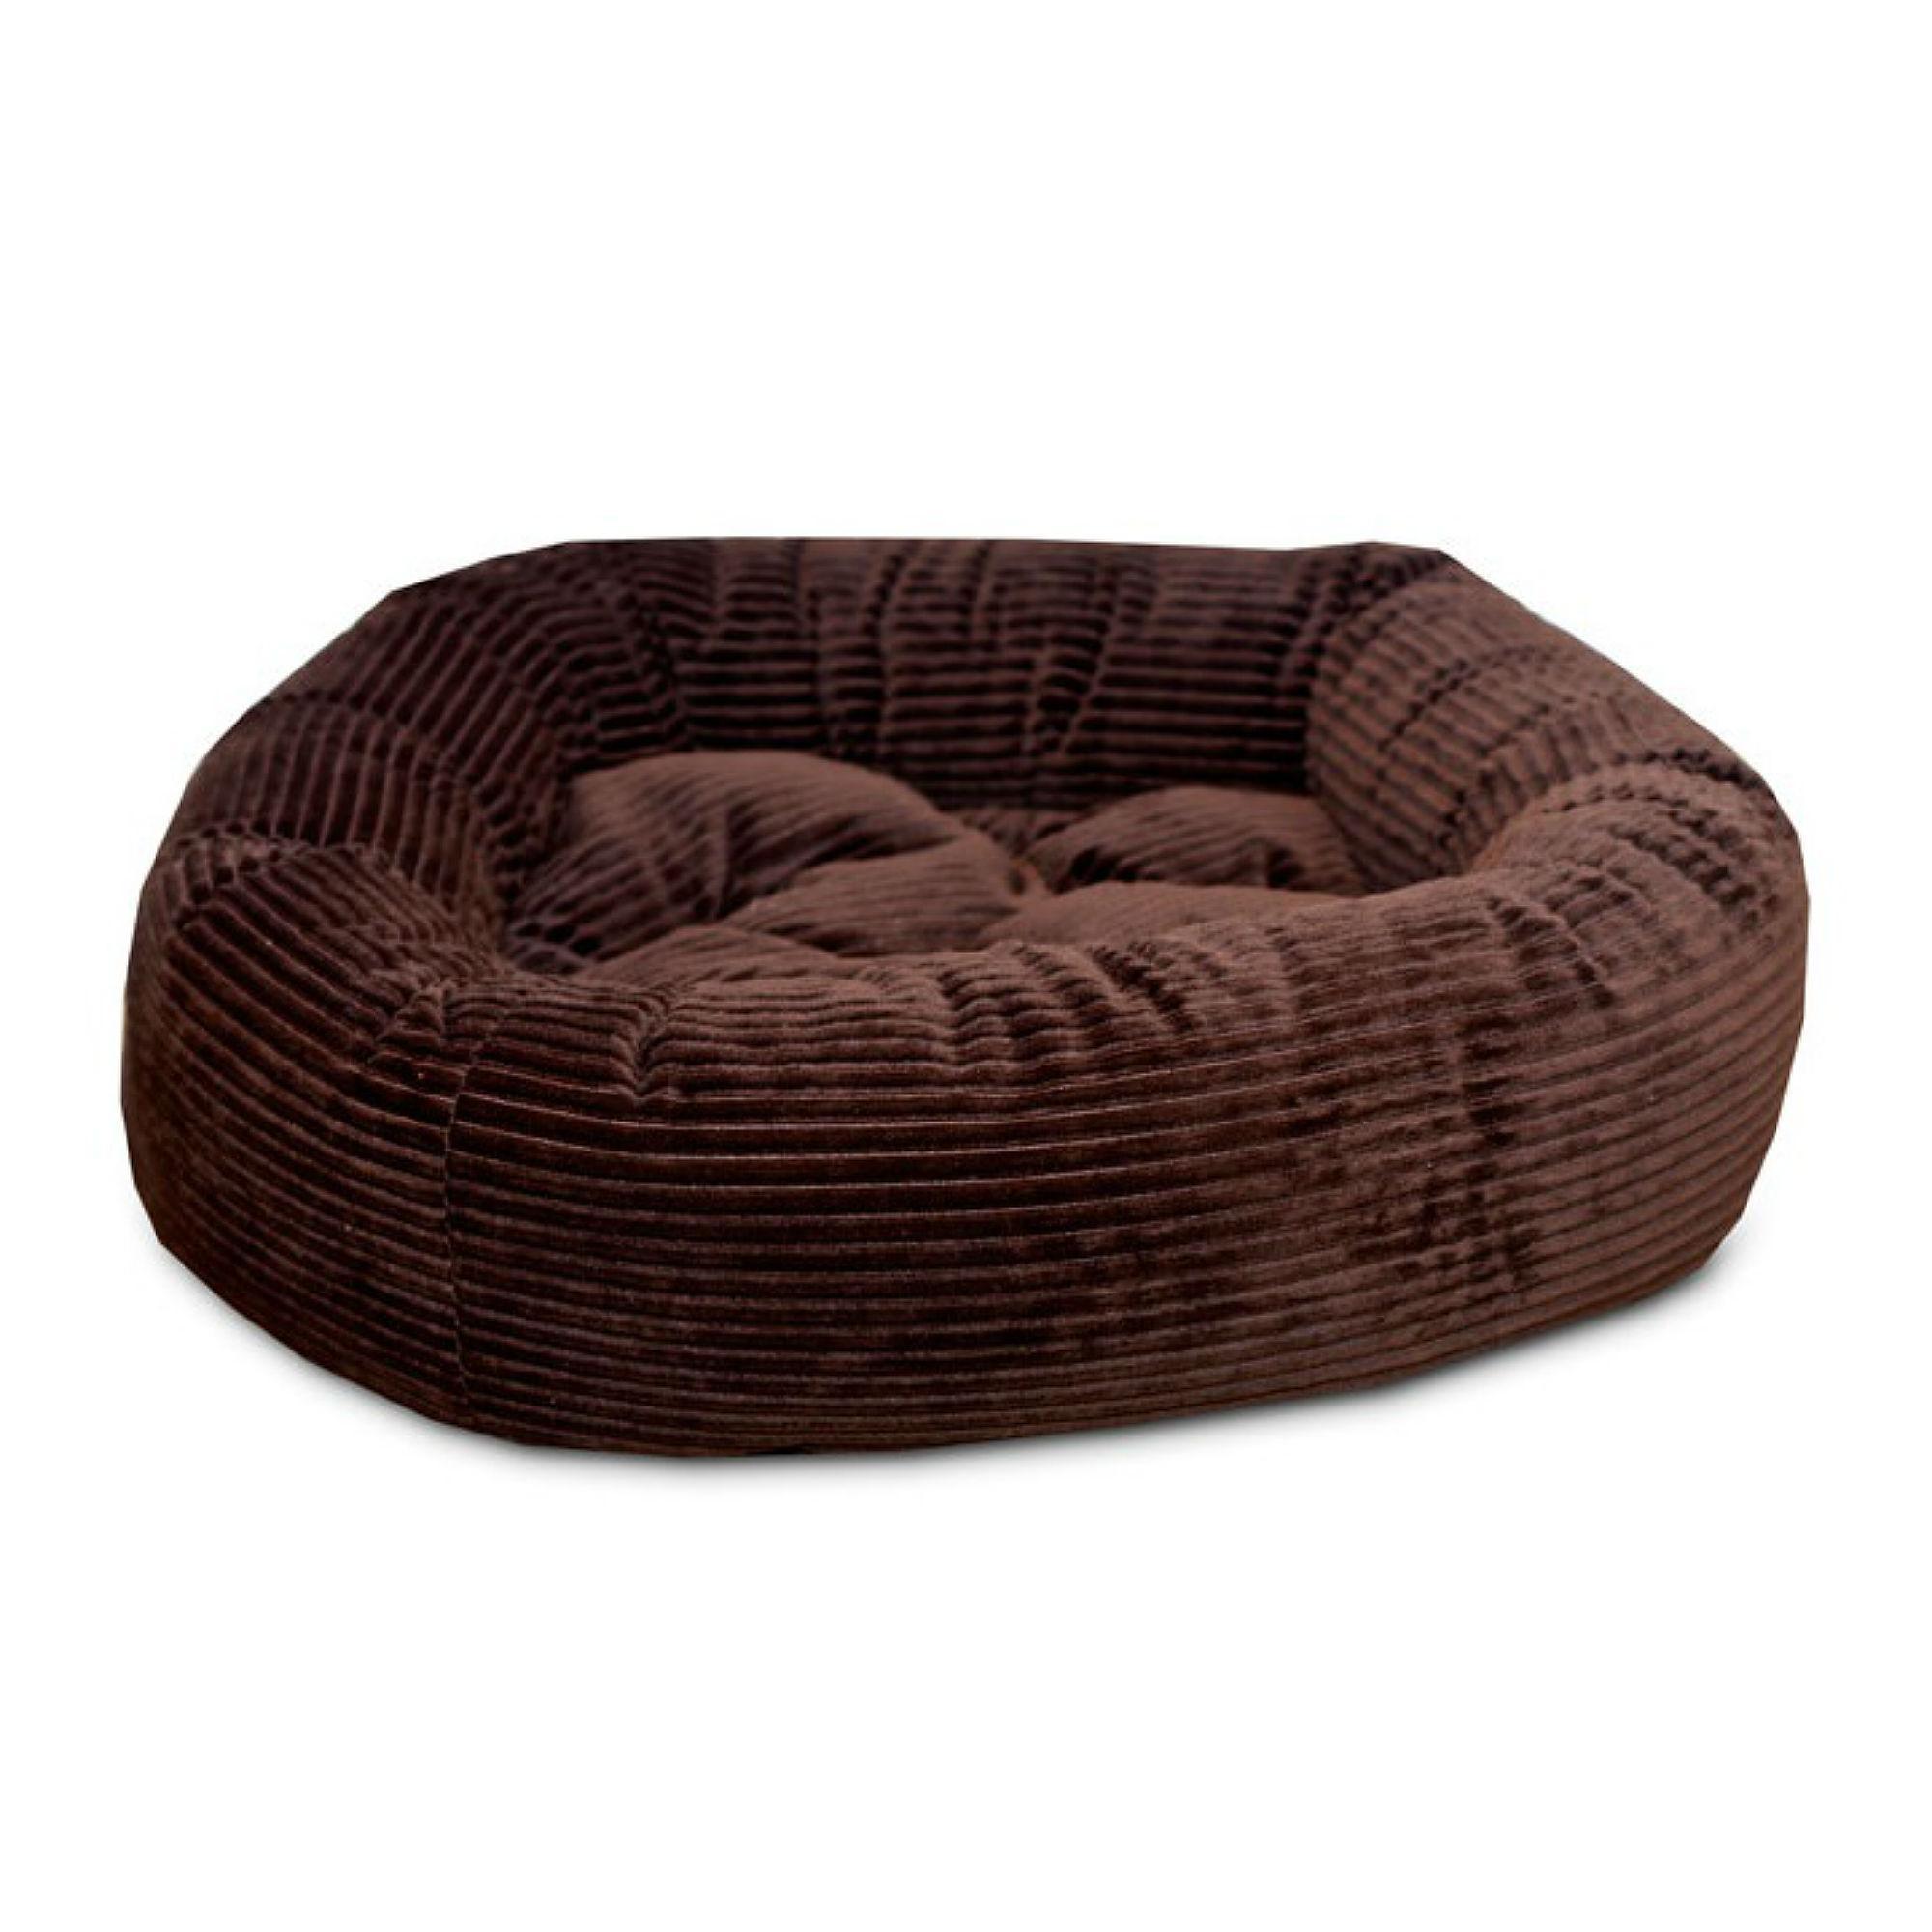 Luca Nest Dog Bed - Chocolate Corduroy